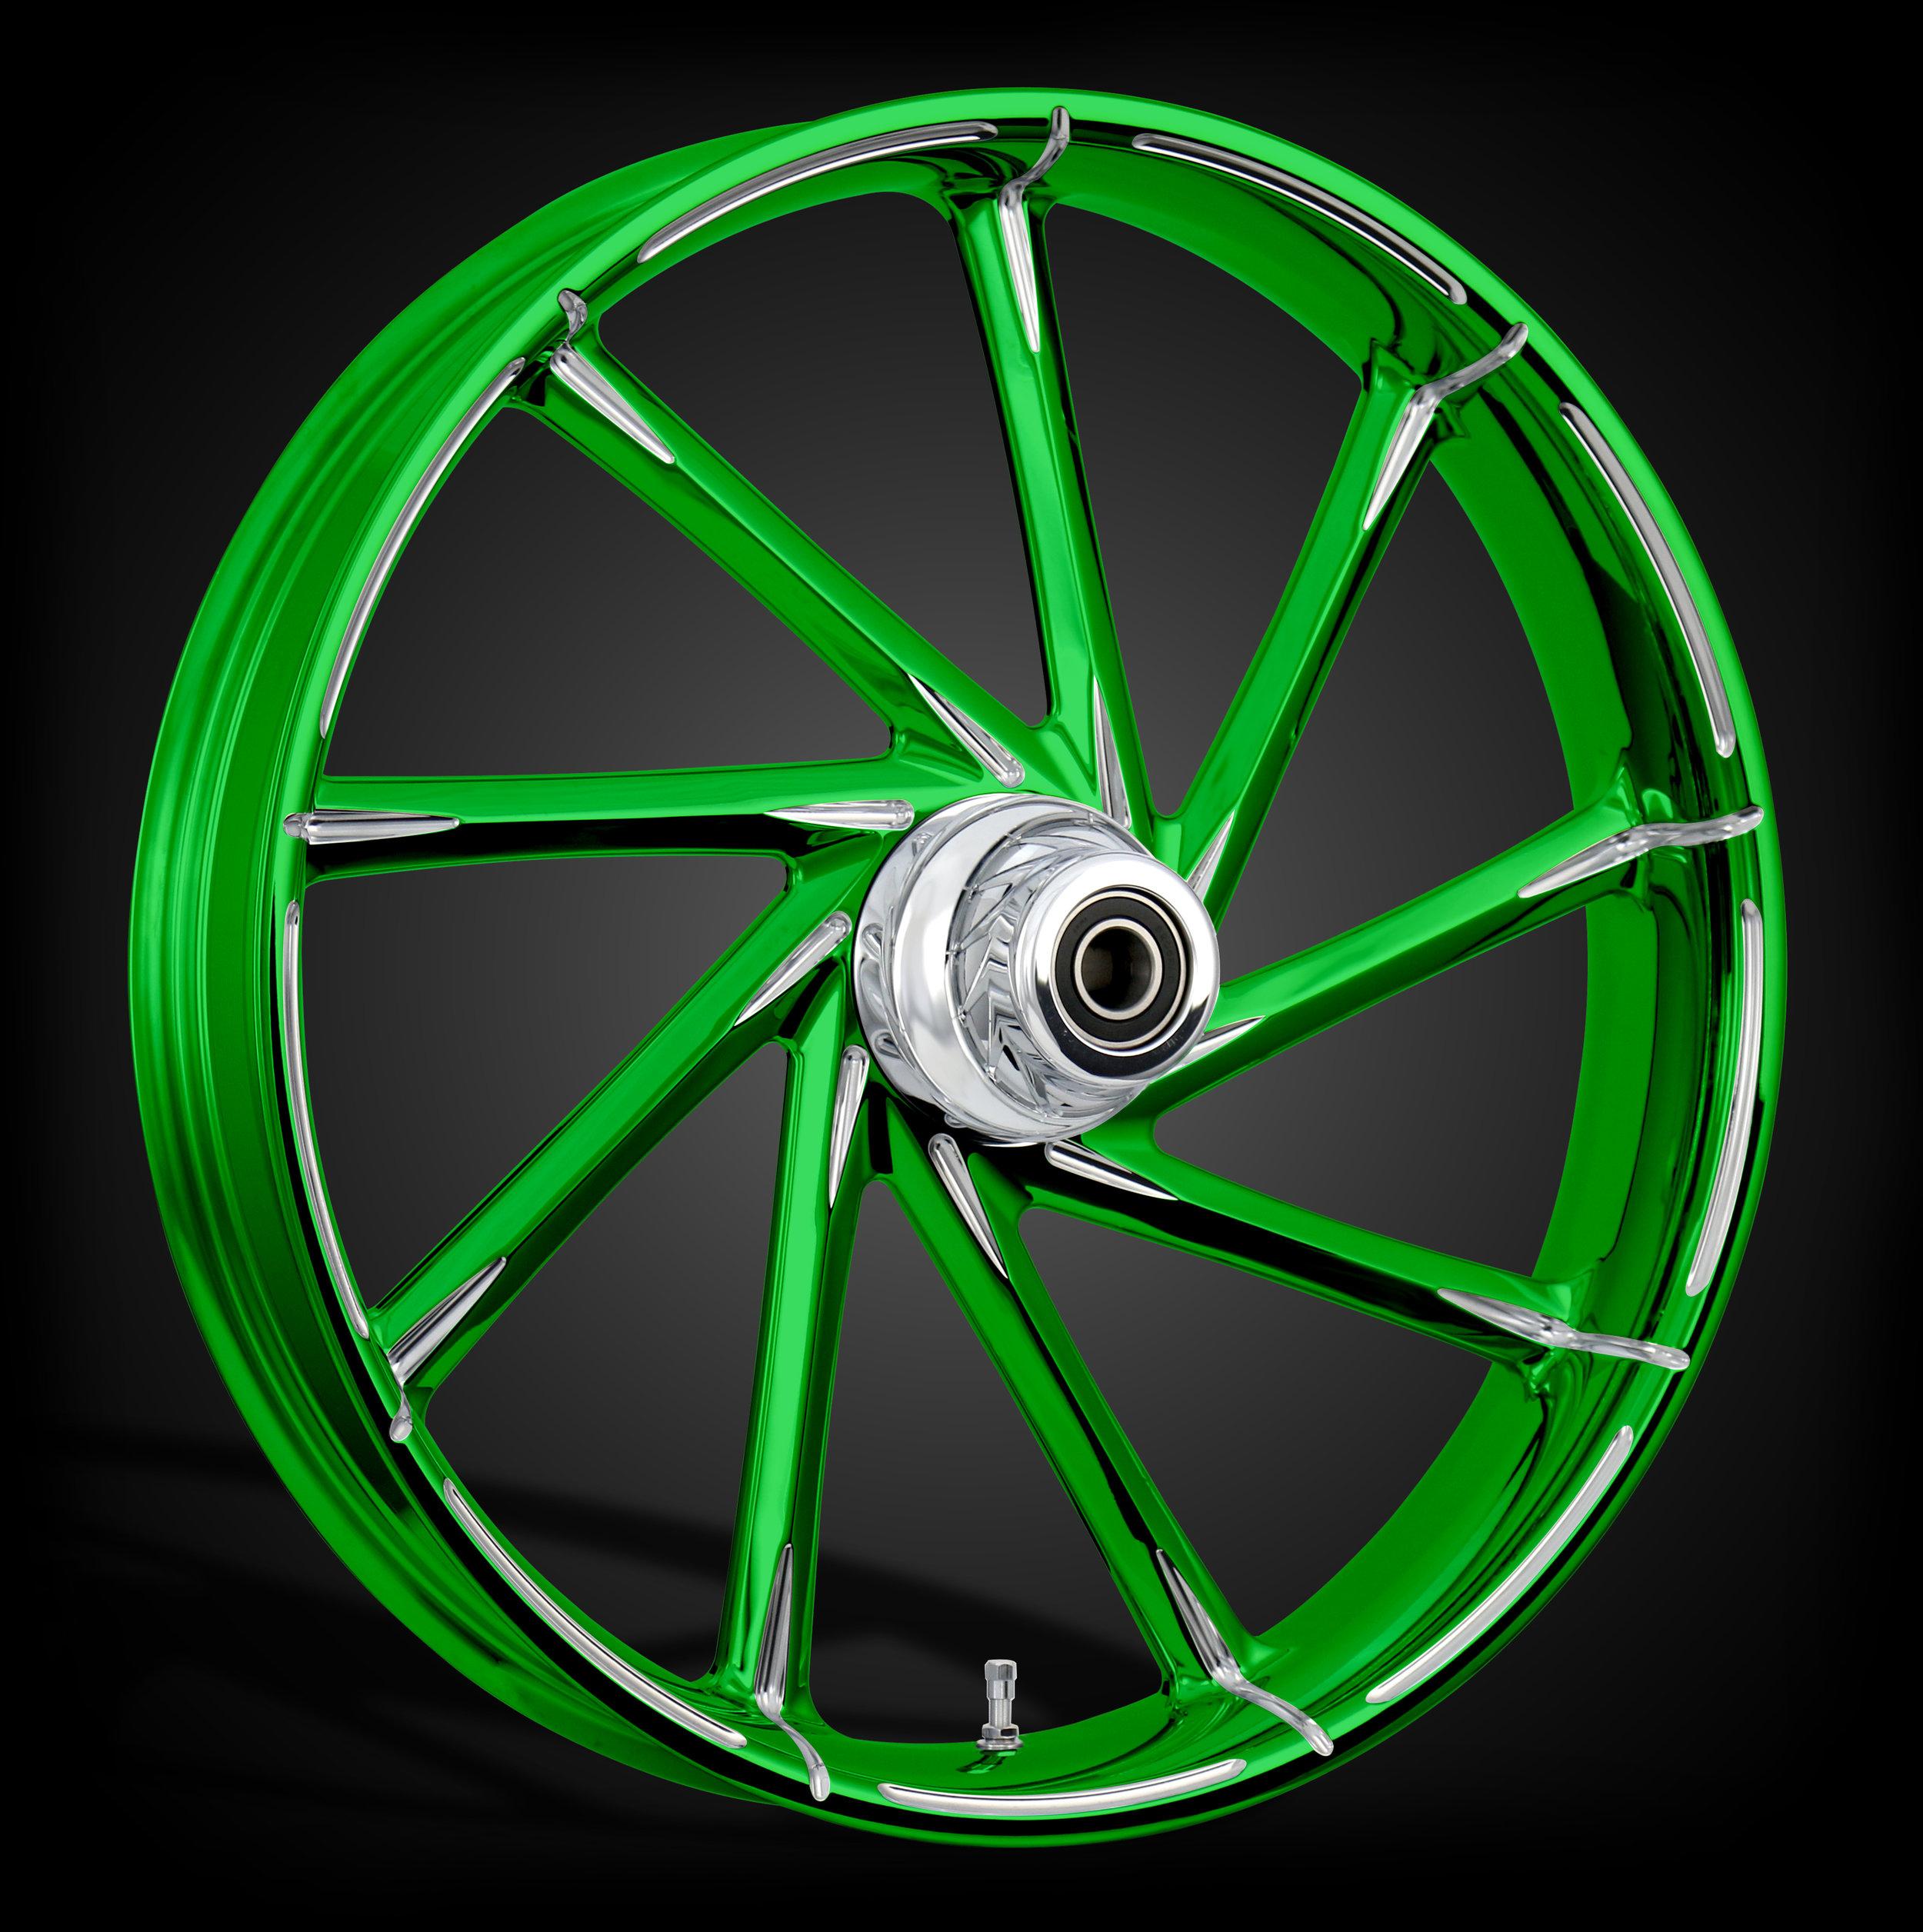 Kinetic-Dye-Line-green.jpg